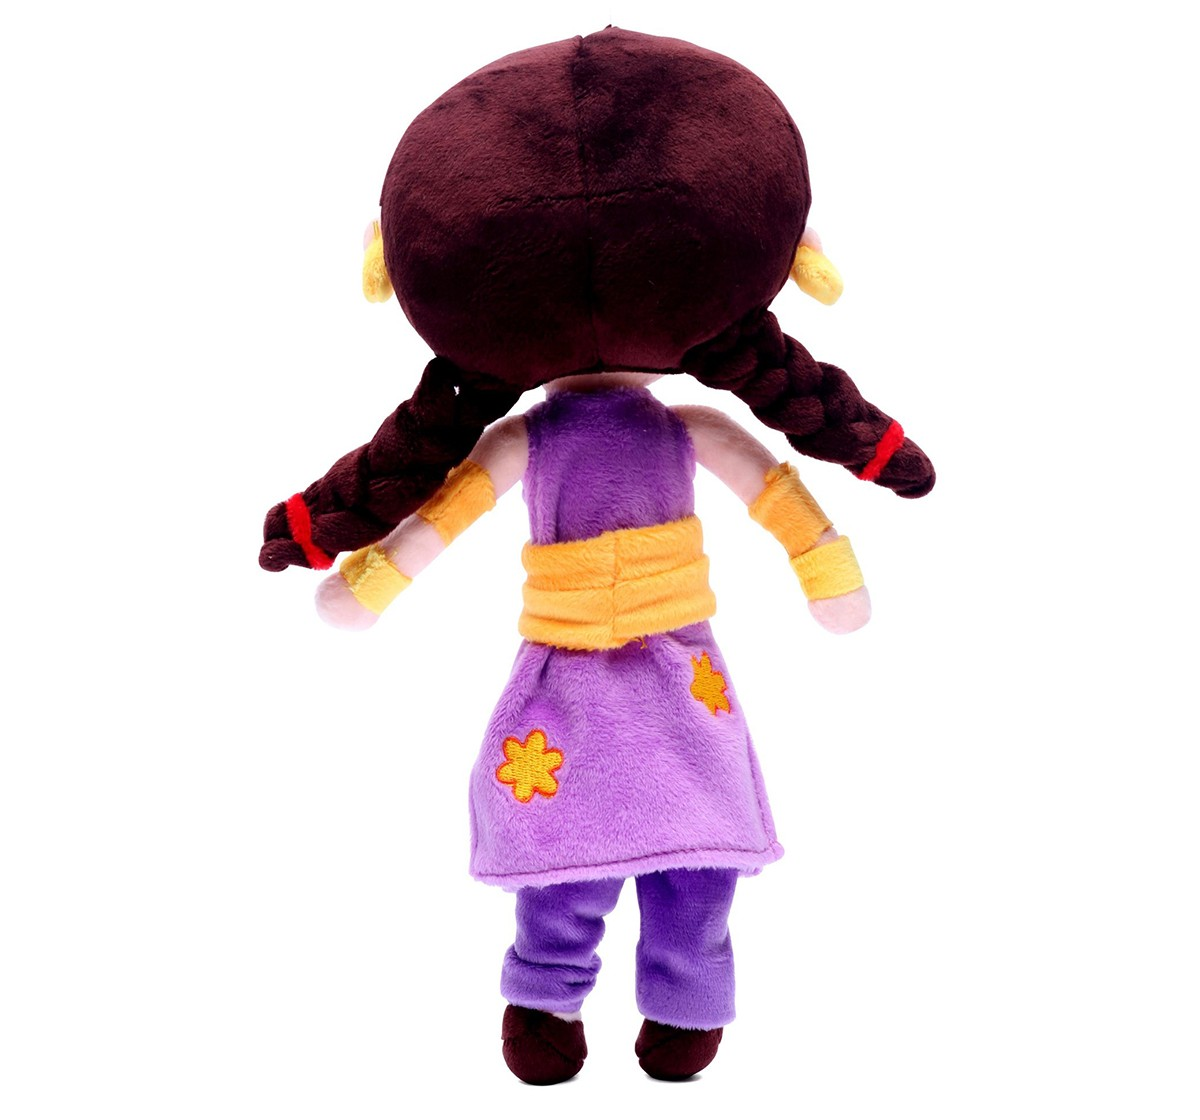 Chhota Bheem Kung Fu Dhamaka Chutki Plush Toy - 30Cm Character Soft Toys for Kids age 3Y+ - 30 Cm